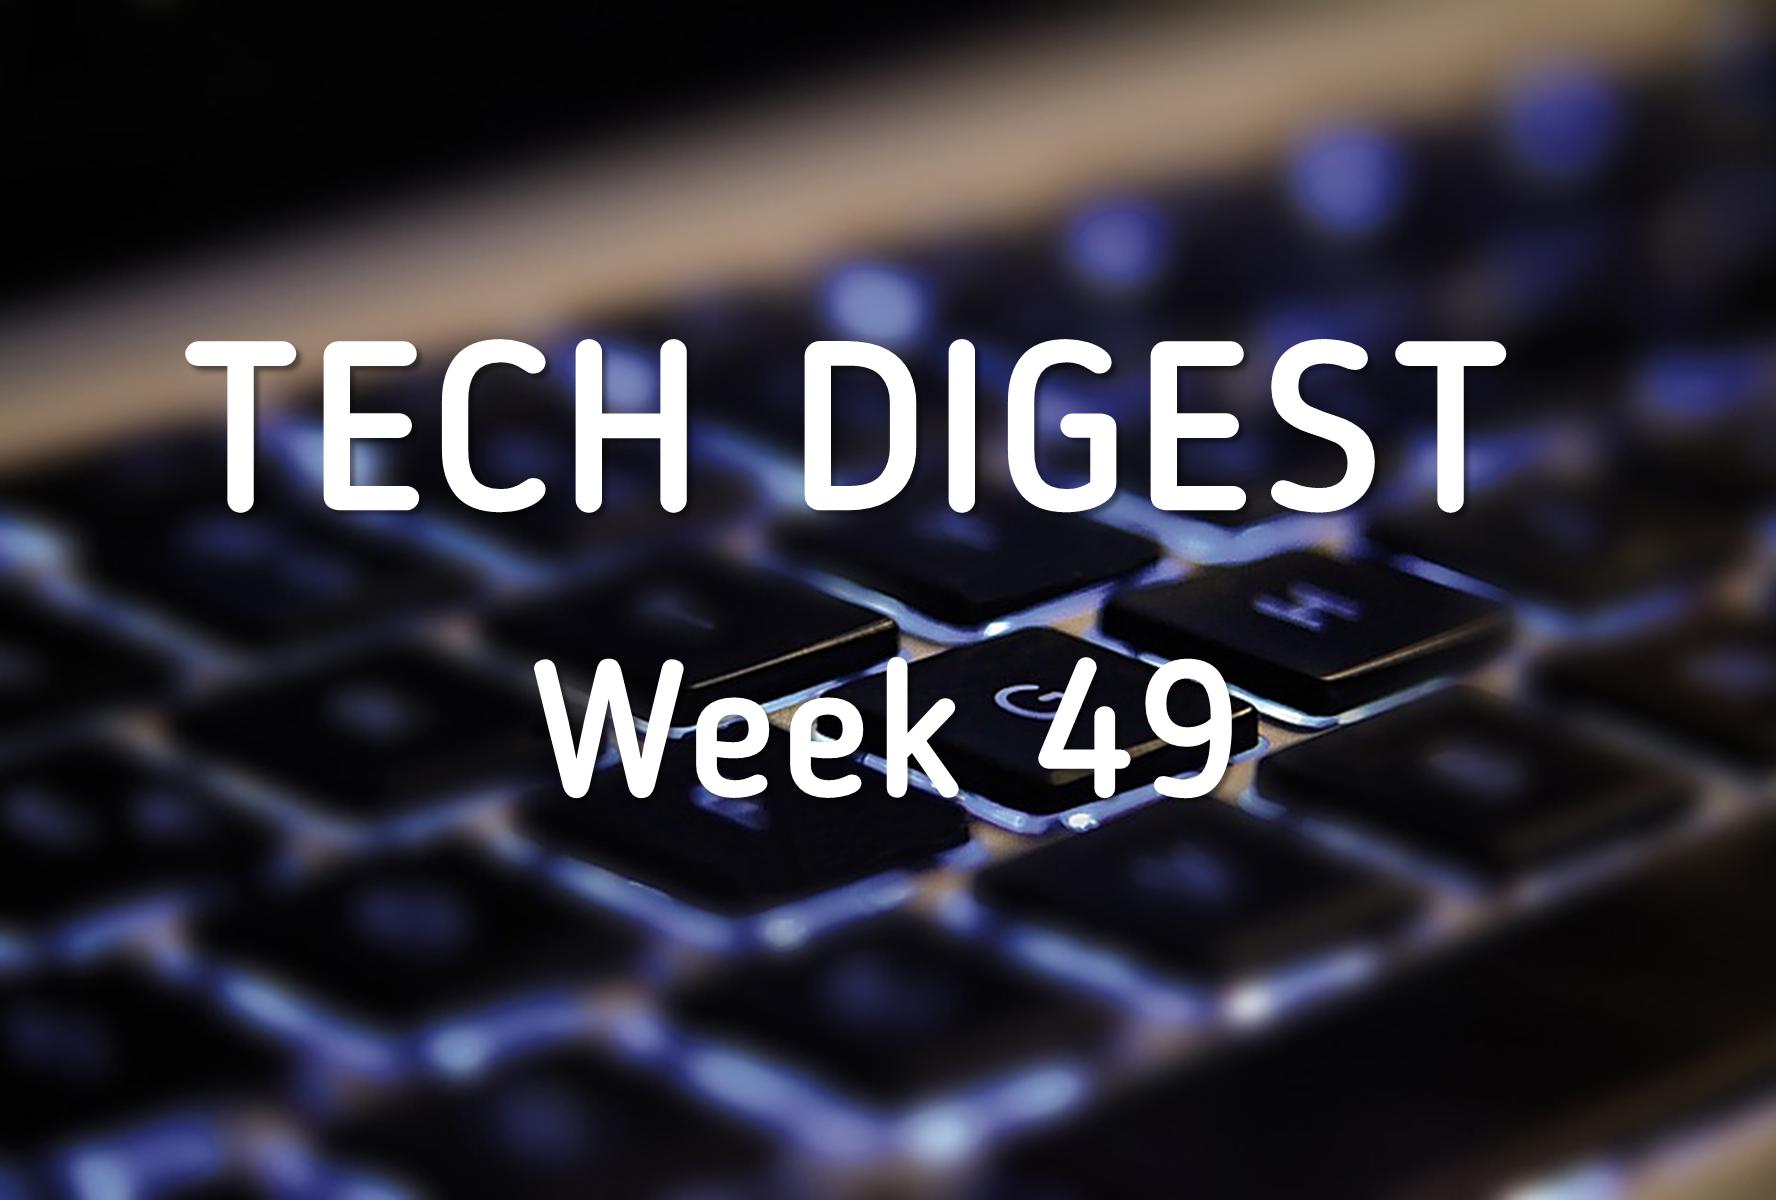 Week 49 Tech digest.png